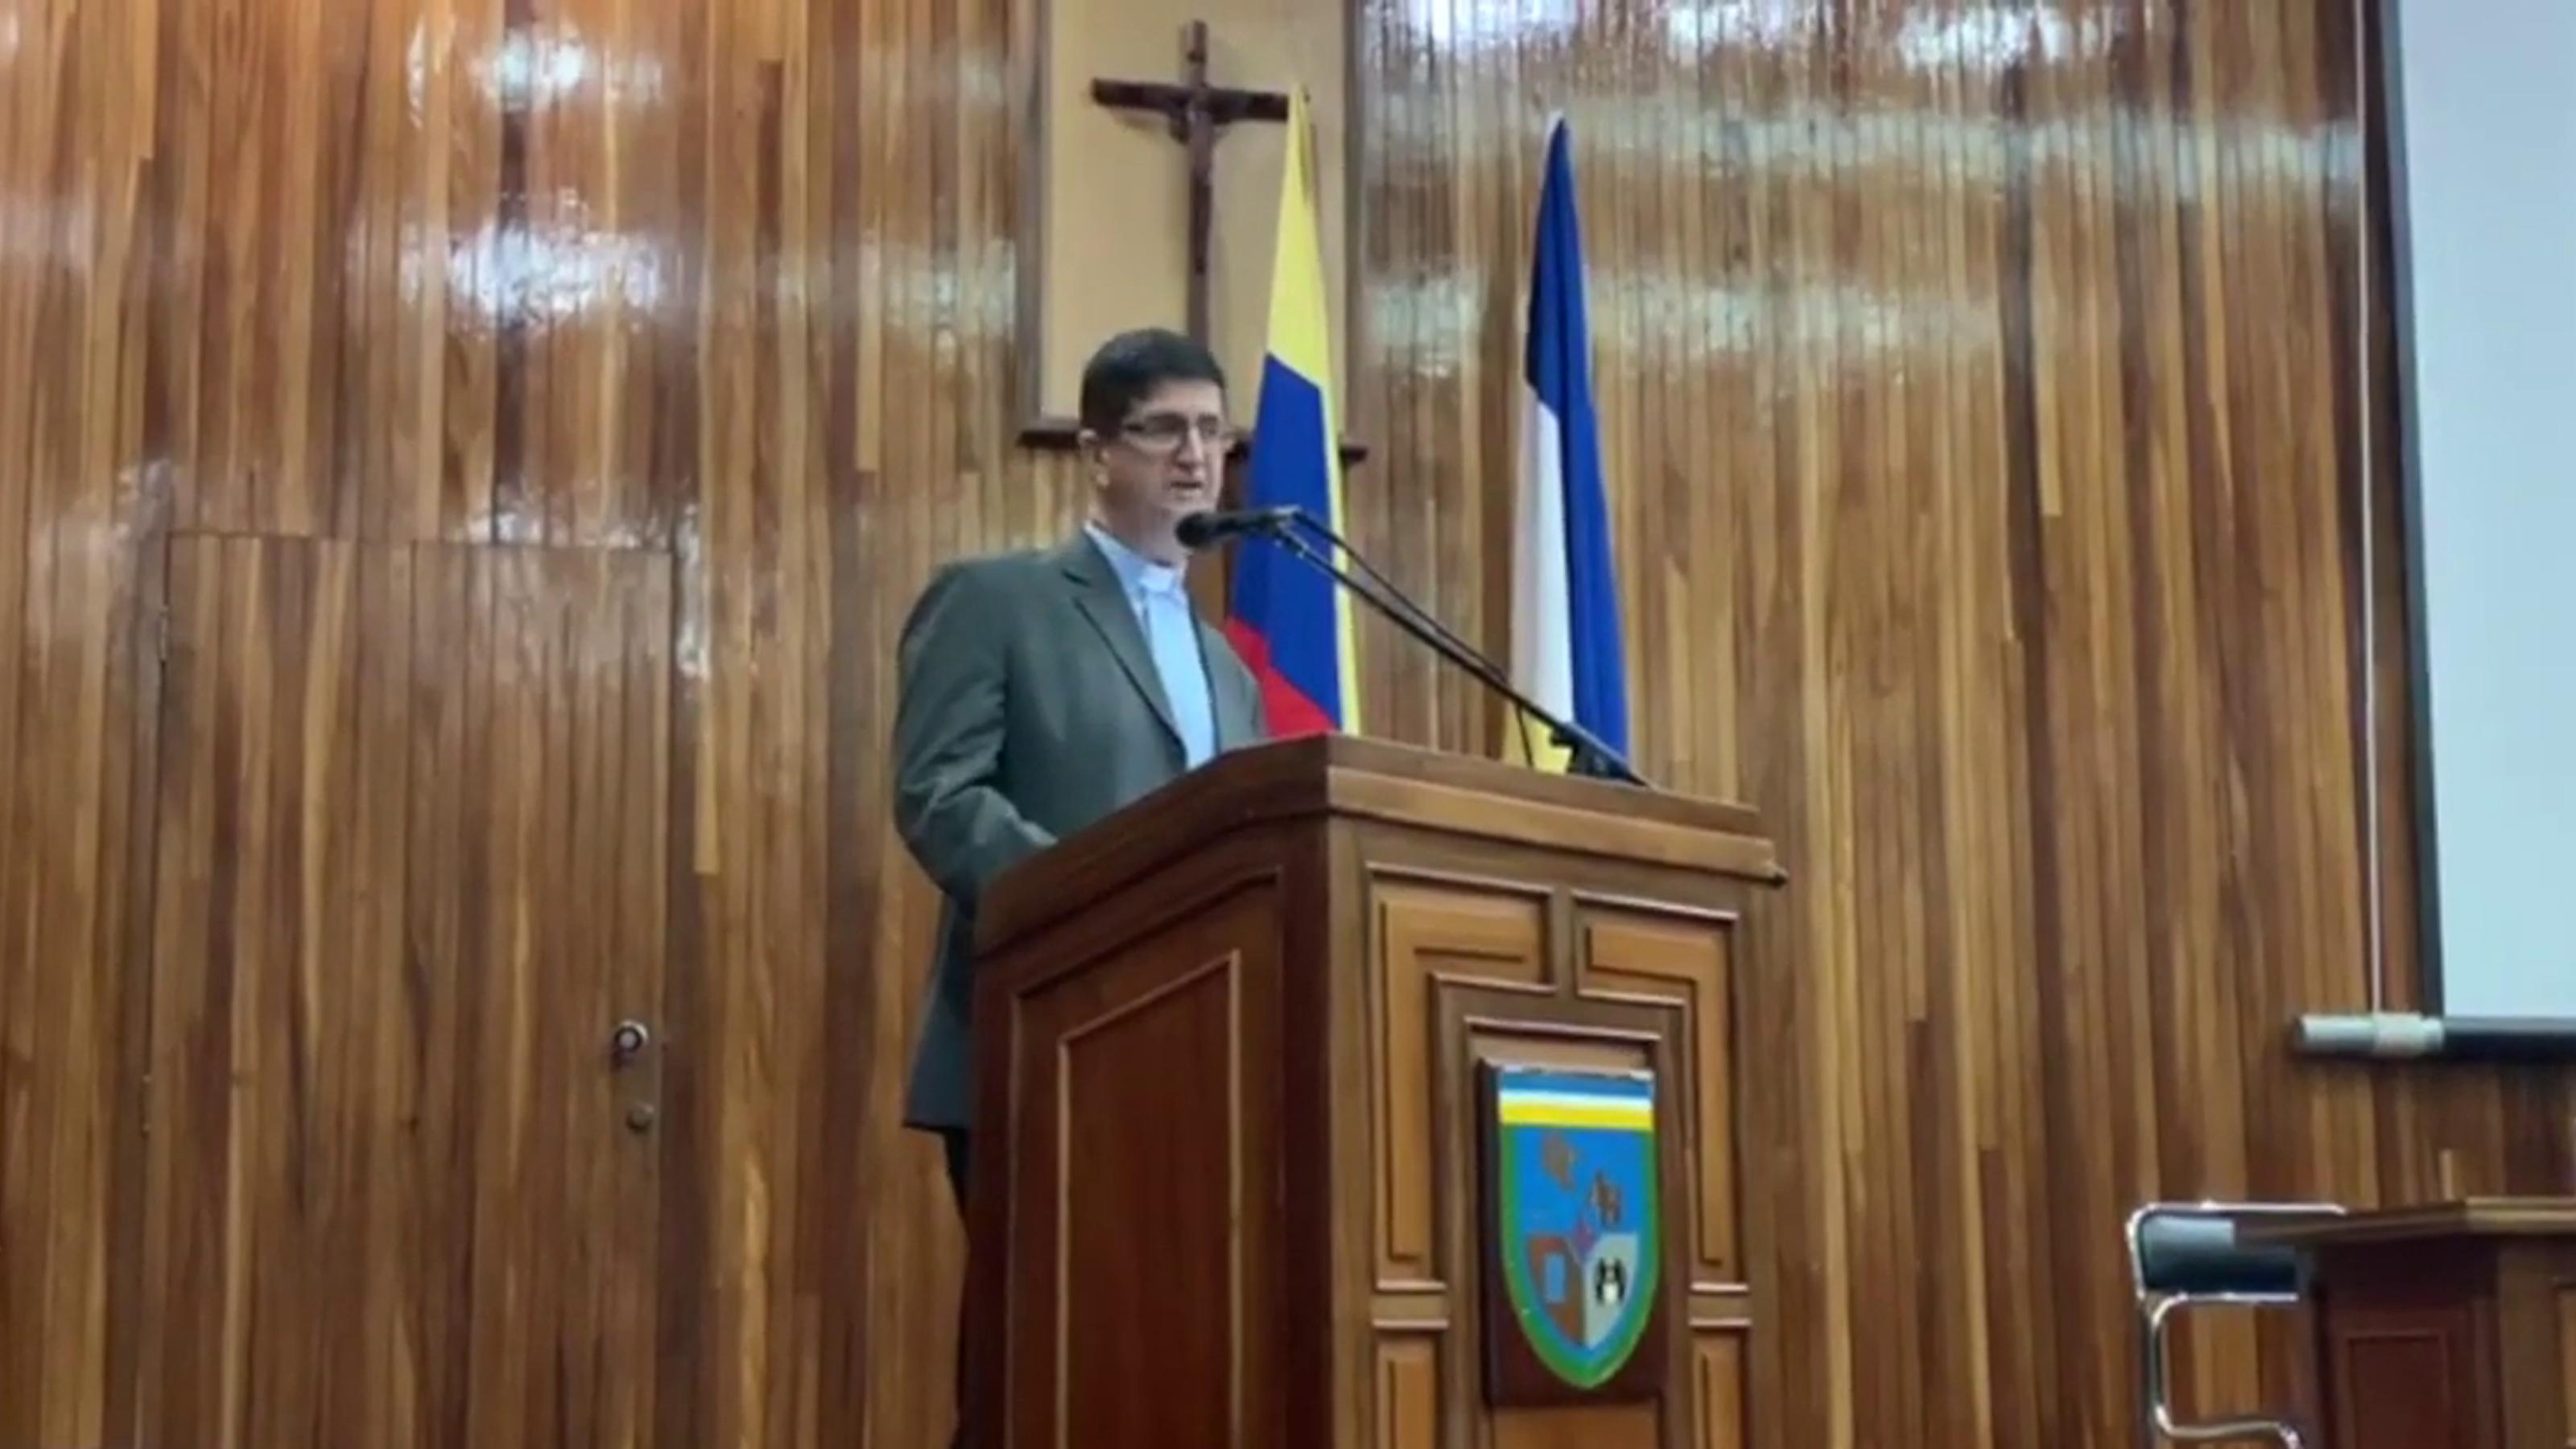 Propuesta pastoral frente a la crisis venezolana